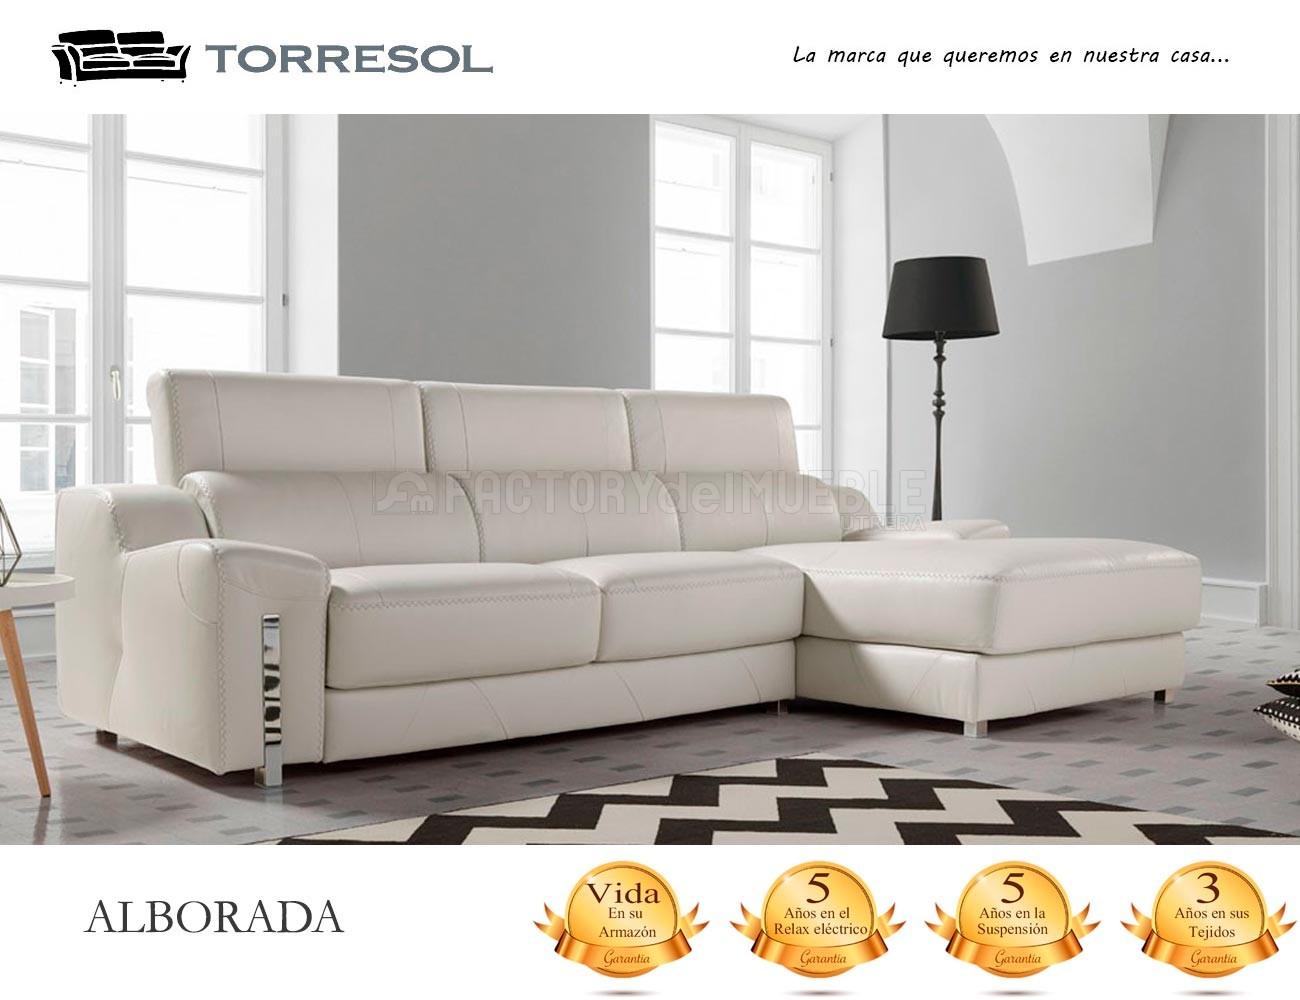 Sofa alborada torresol1